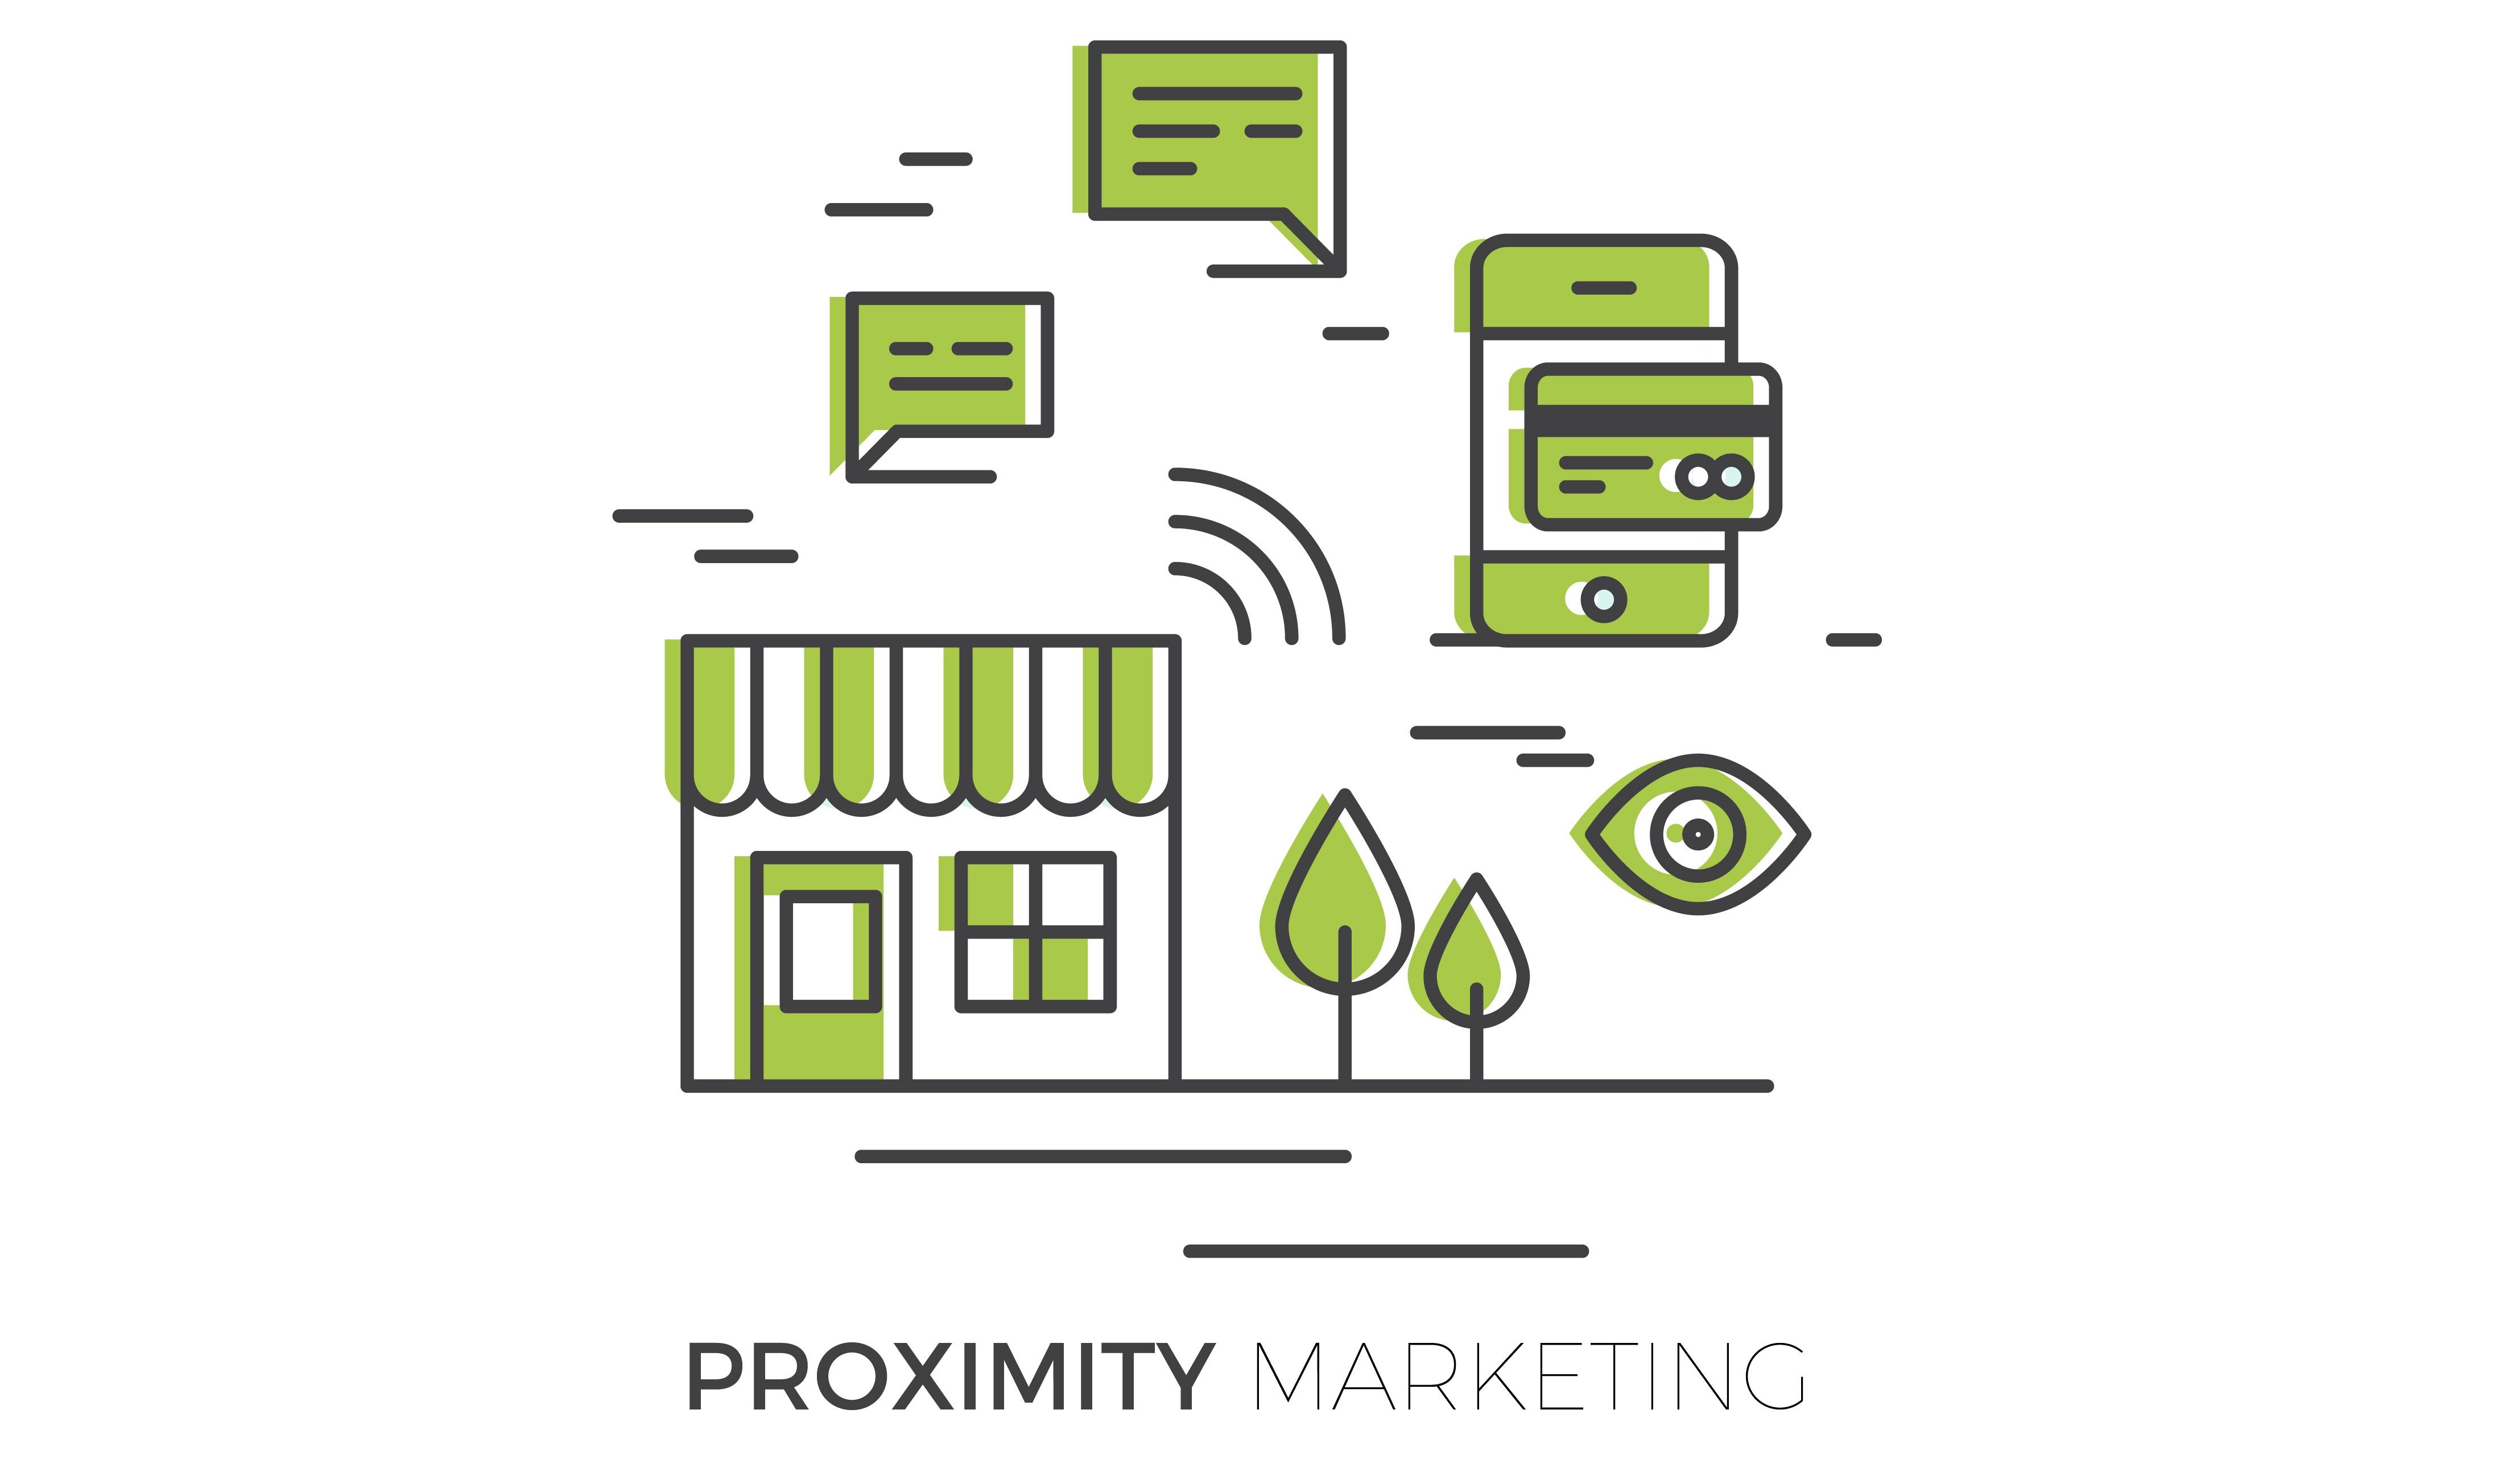 proxmark1-01.jpg